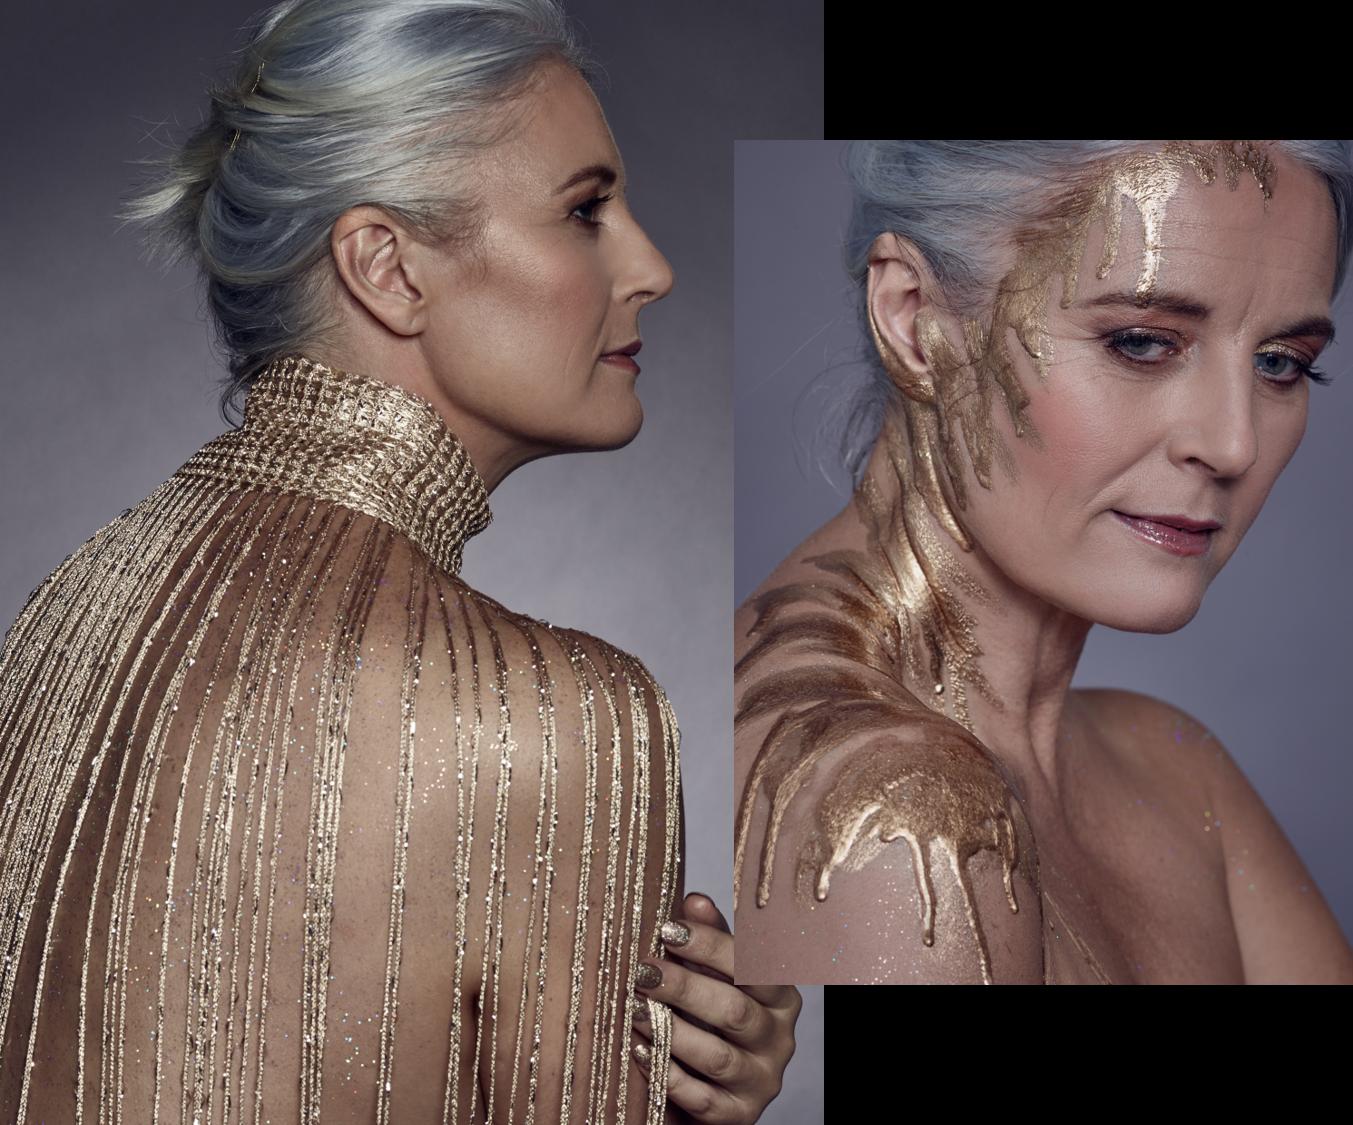 Rachel Peru female curve model shoots for Goldie Magazine Bridge Models London